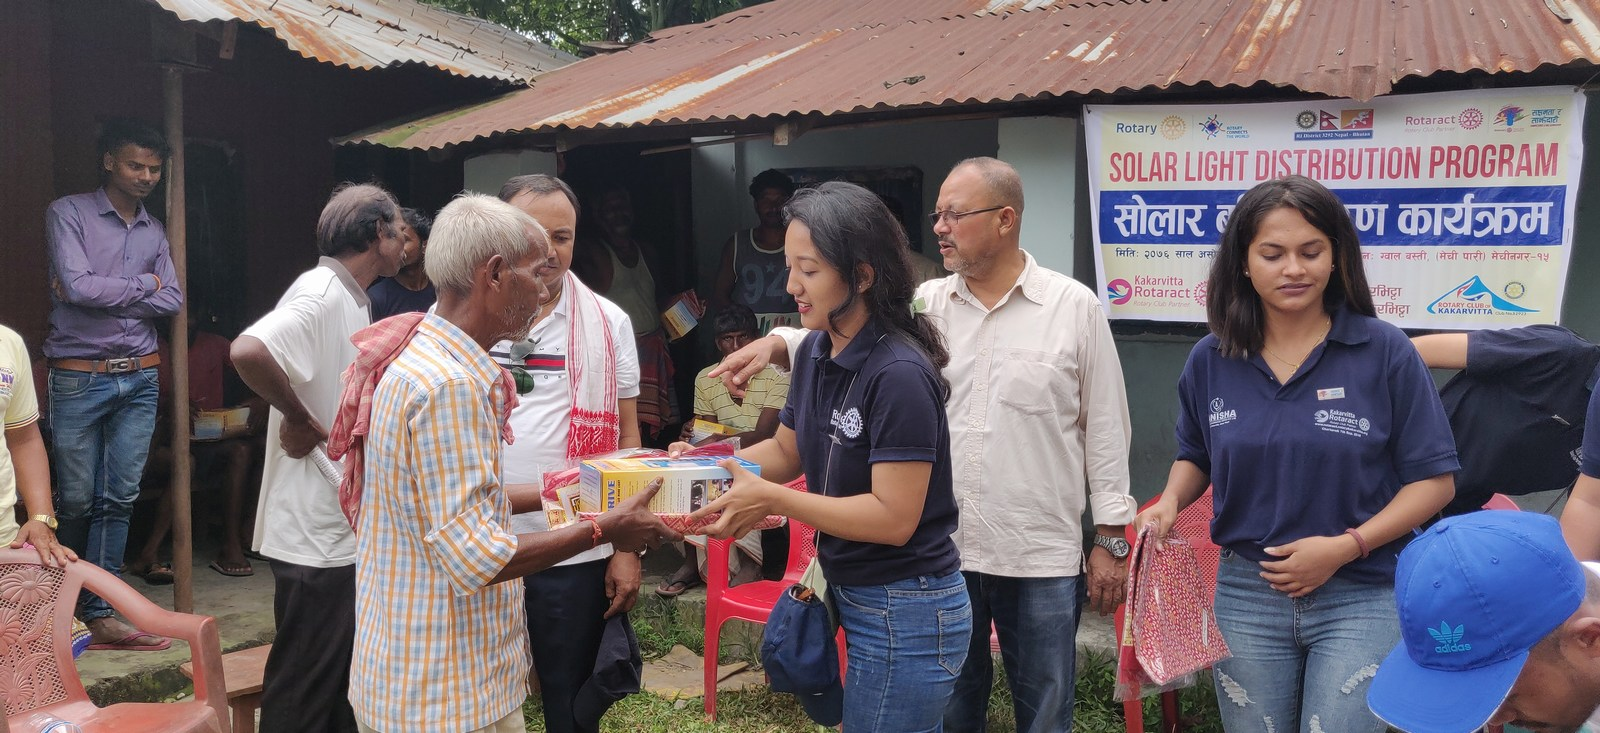 Solar-Light-Distribution-Program-Rotary-Club-of-Kakarvitta-20